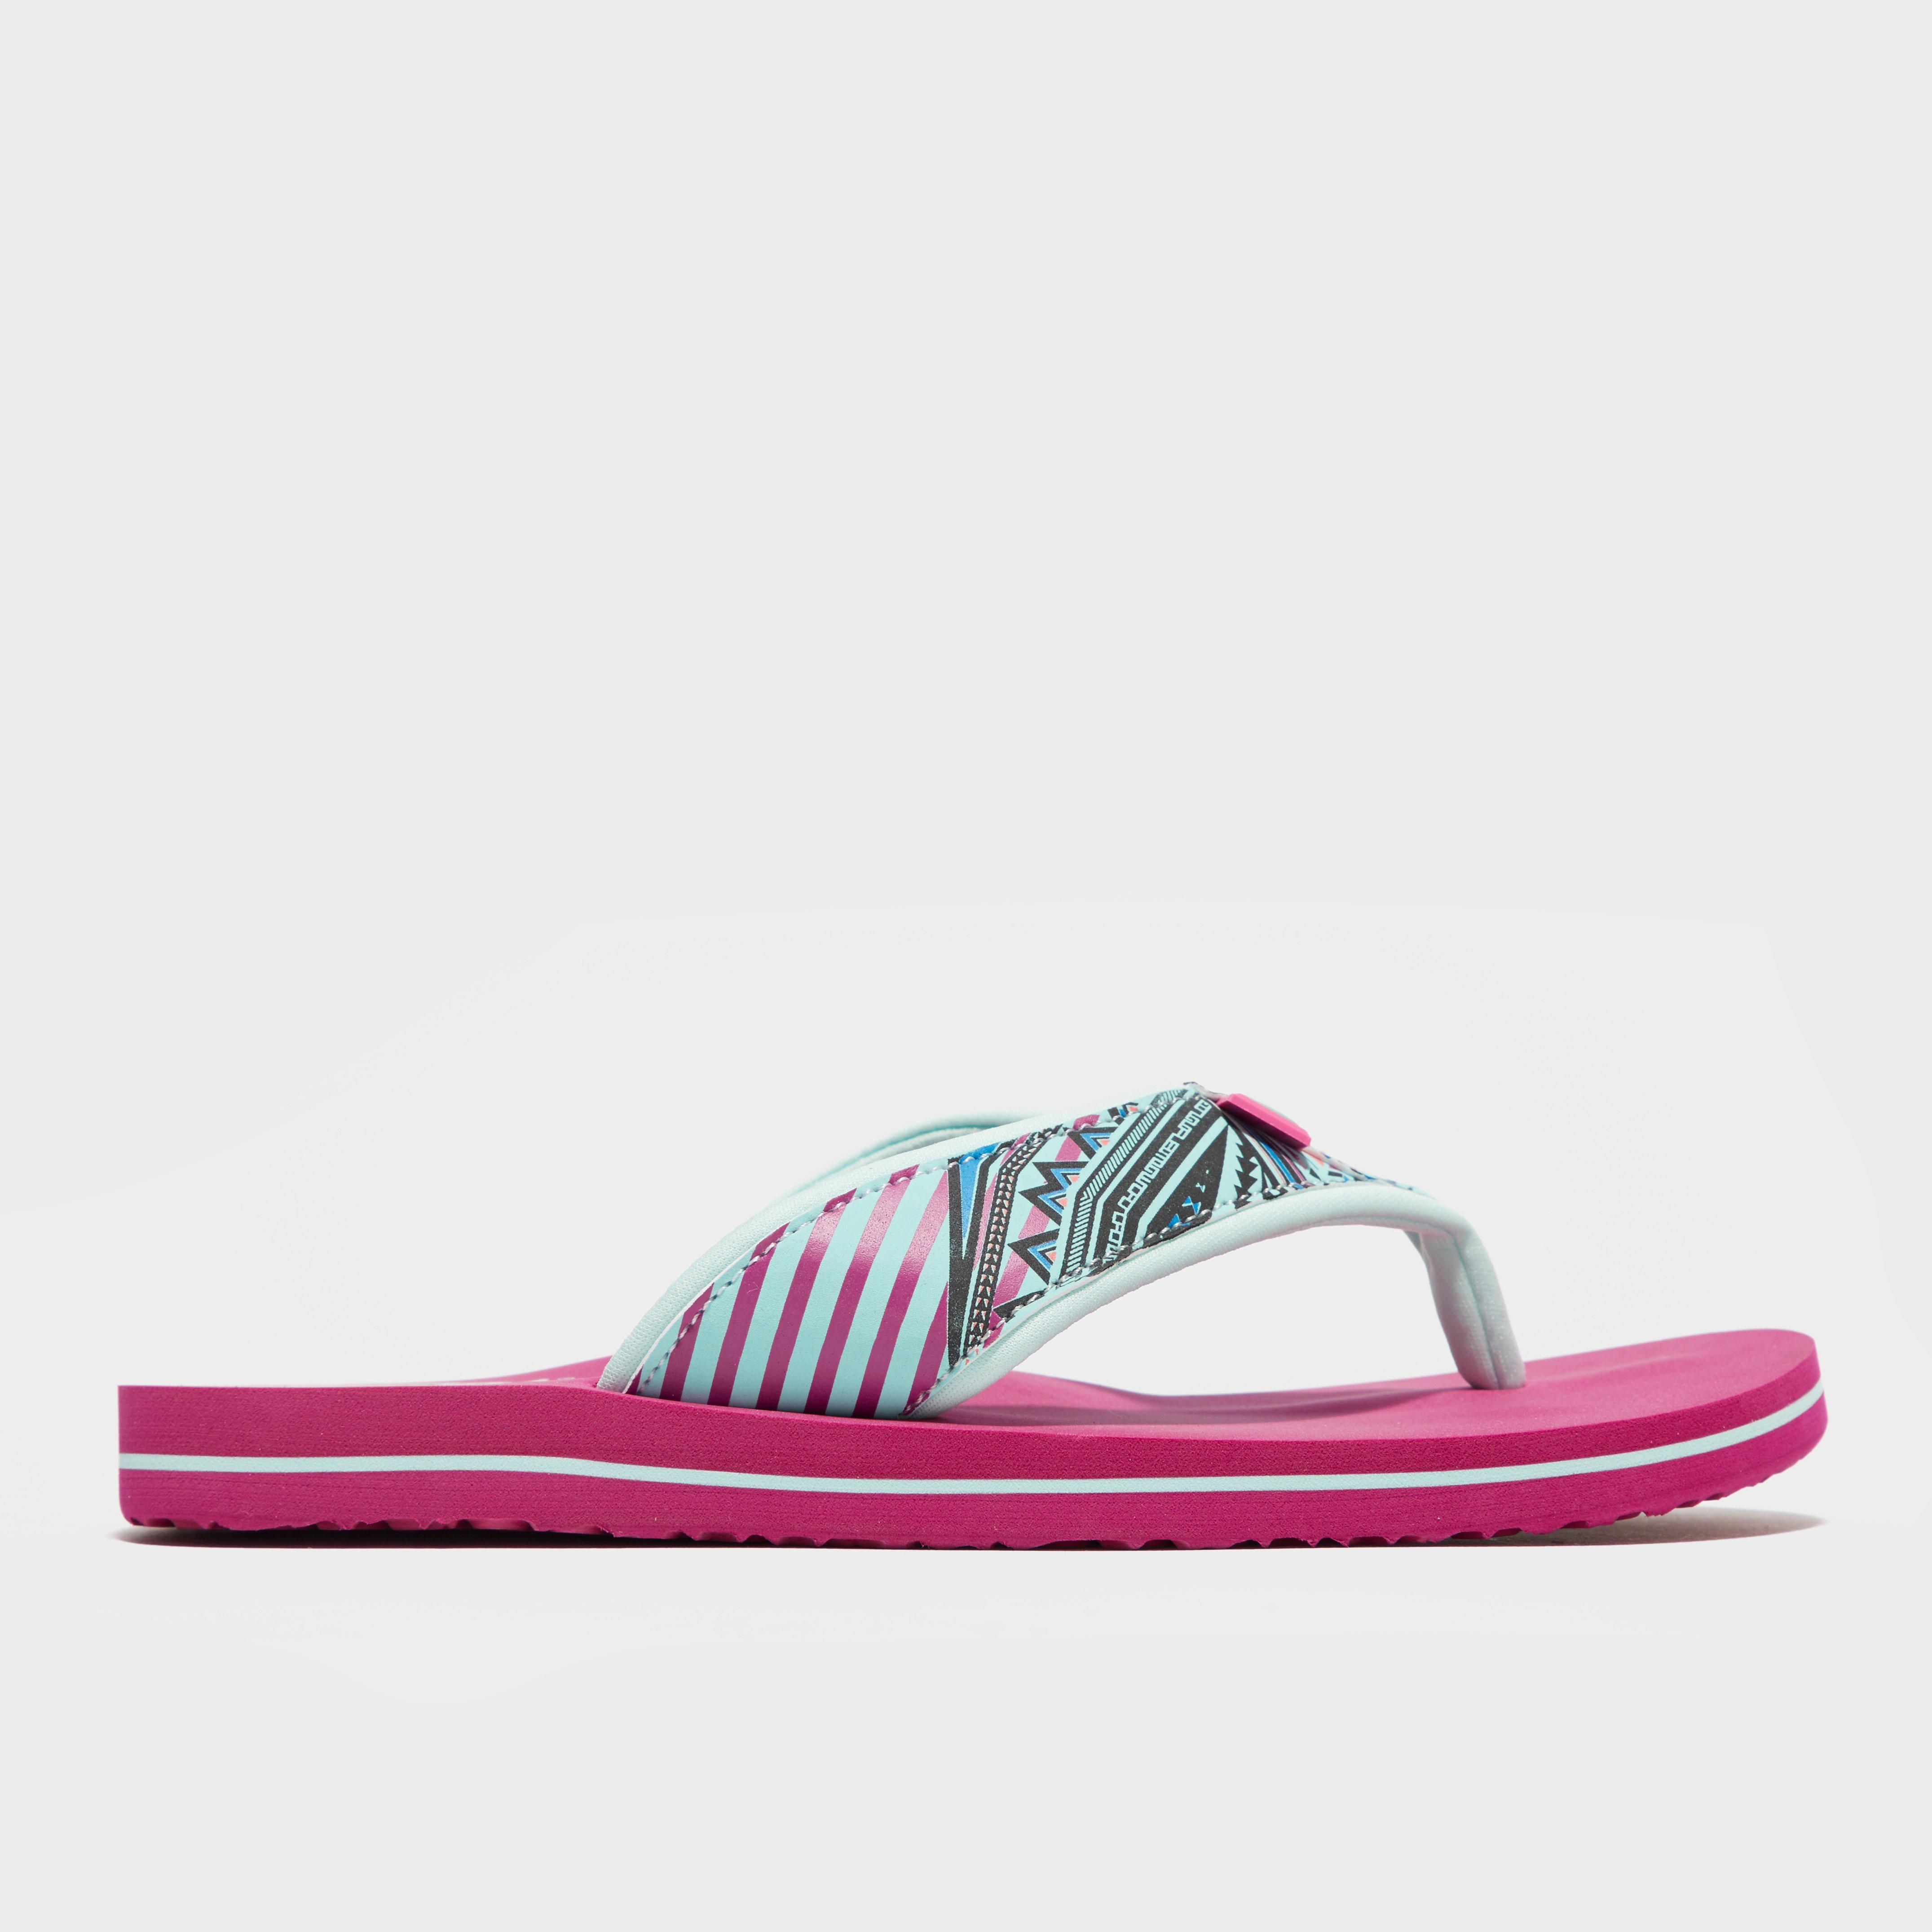 Animal Womens Swish Slim Flip Flops Pink